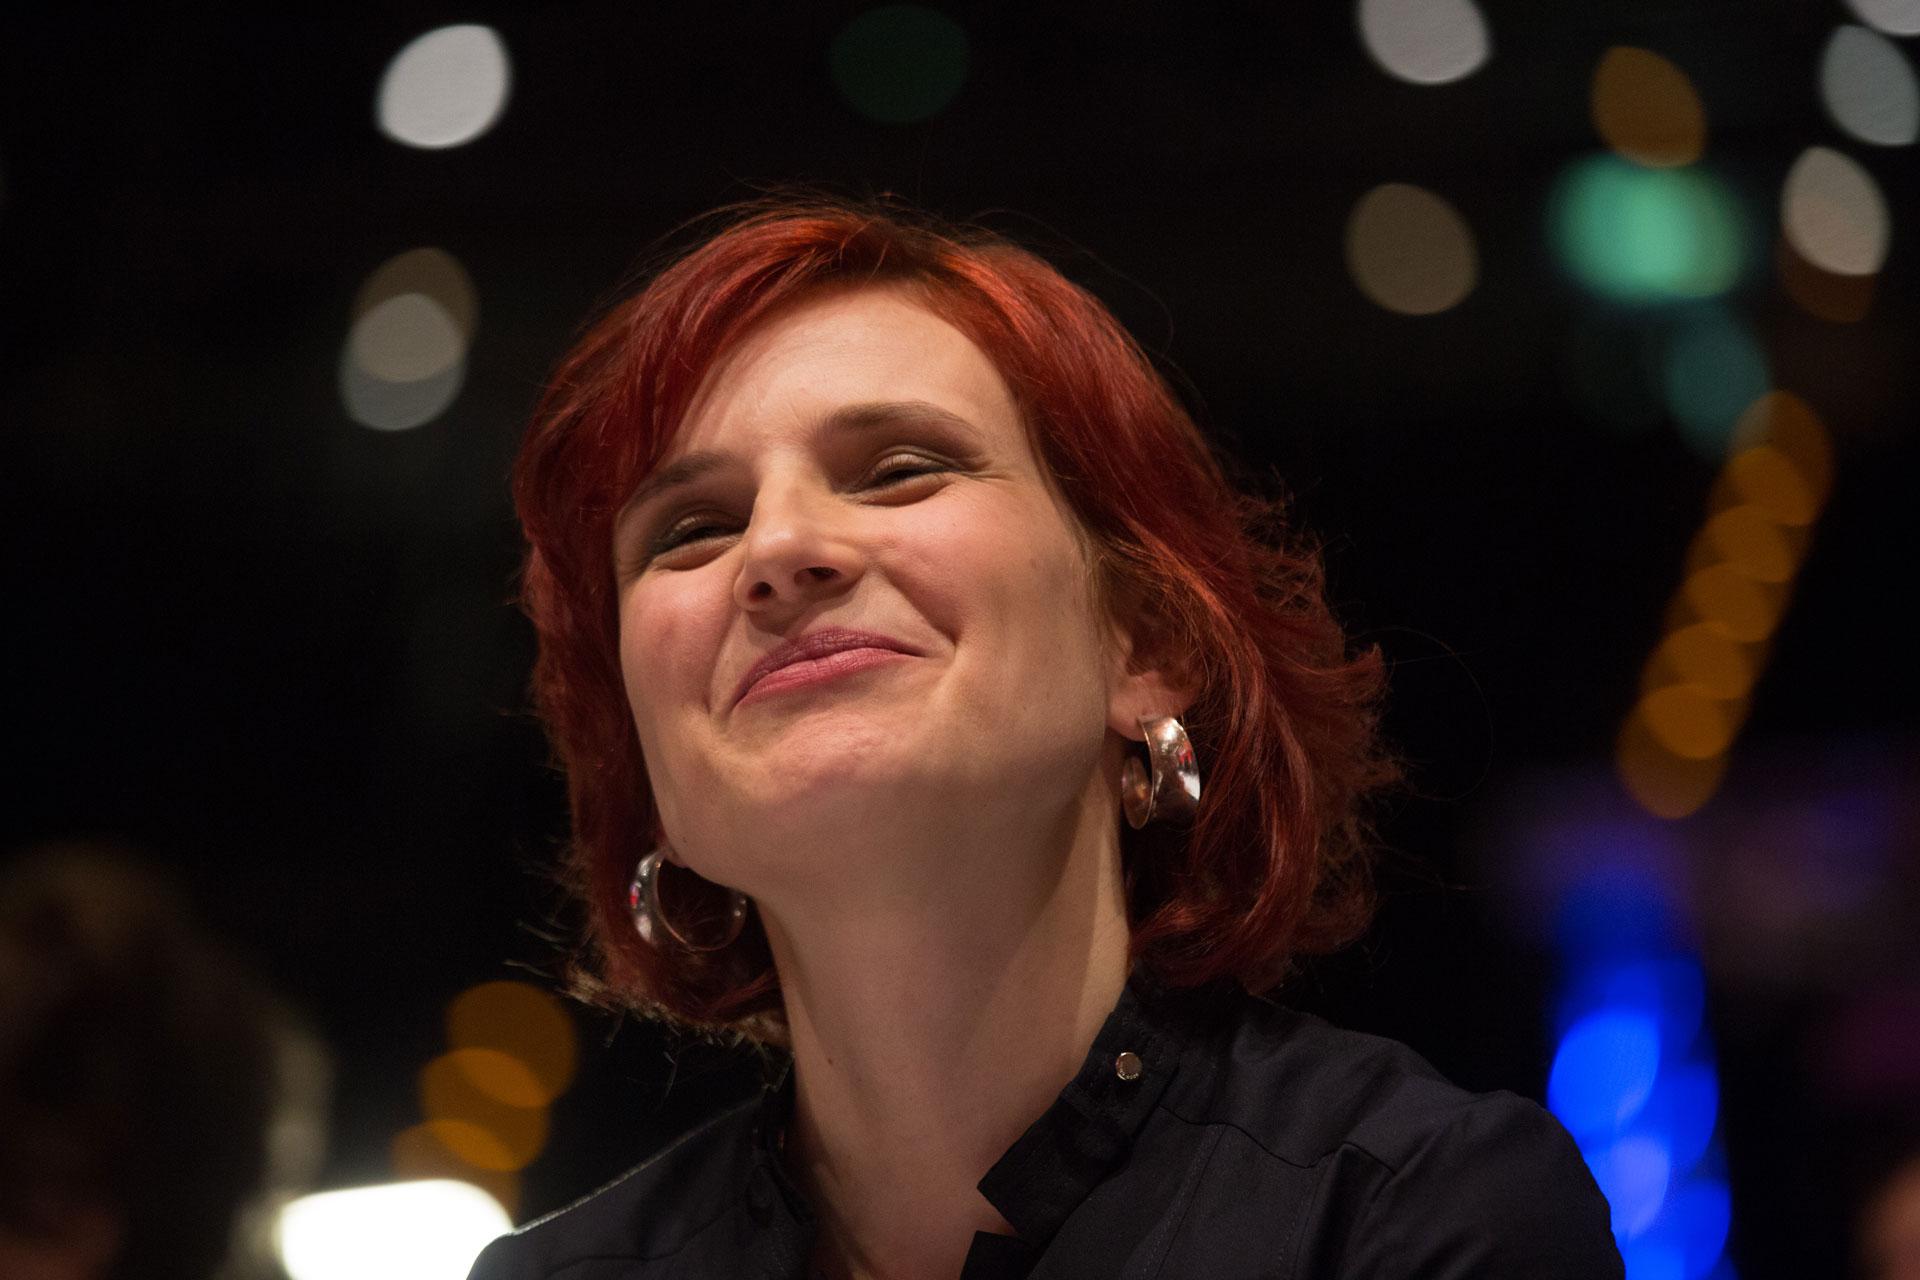 Katja Kipping /DIE LINKE